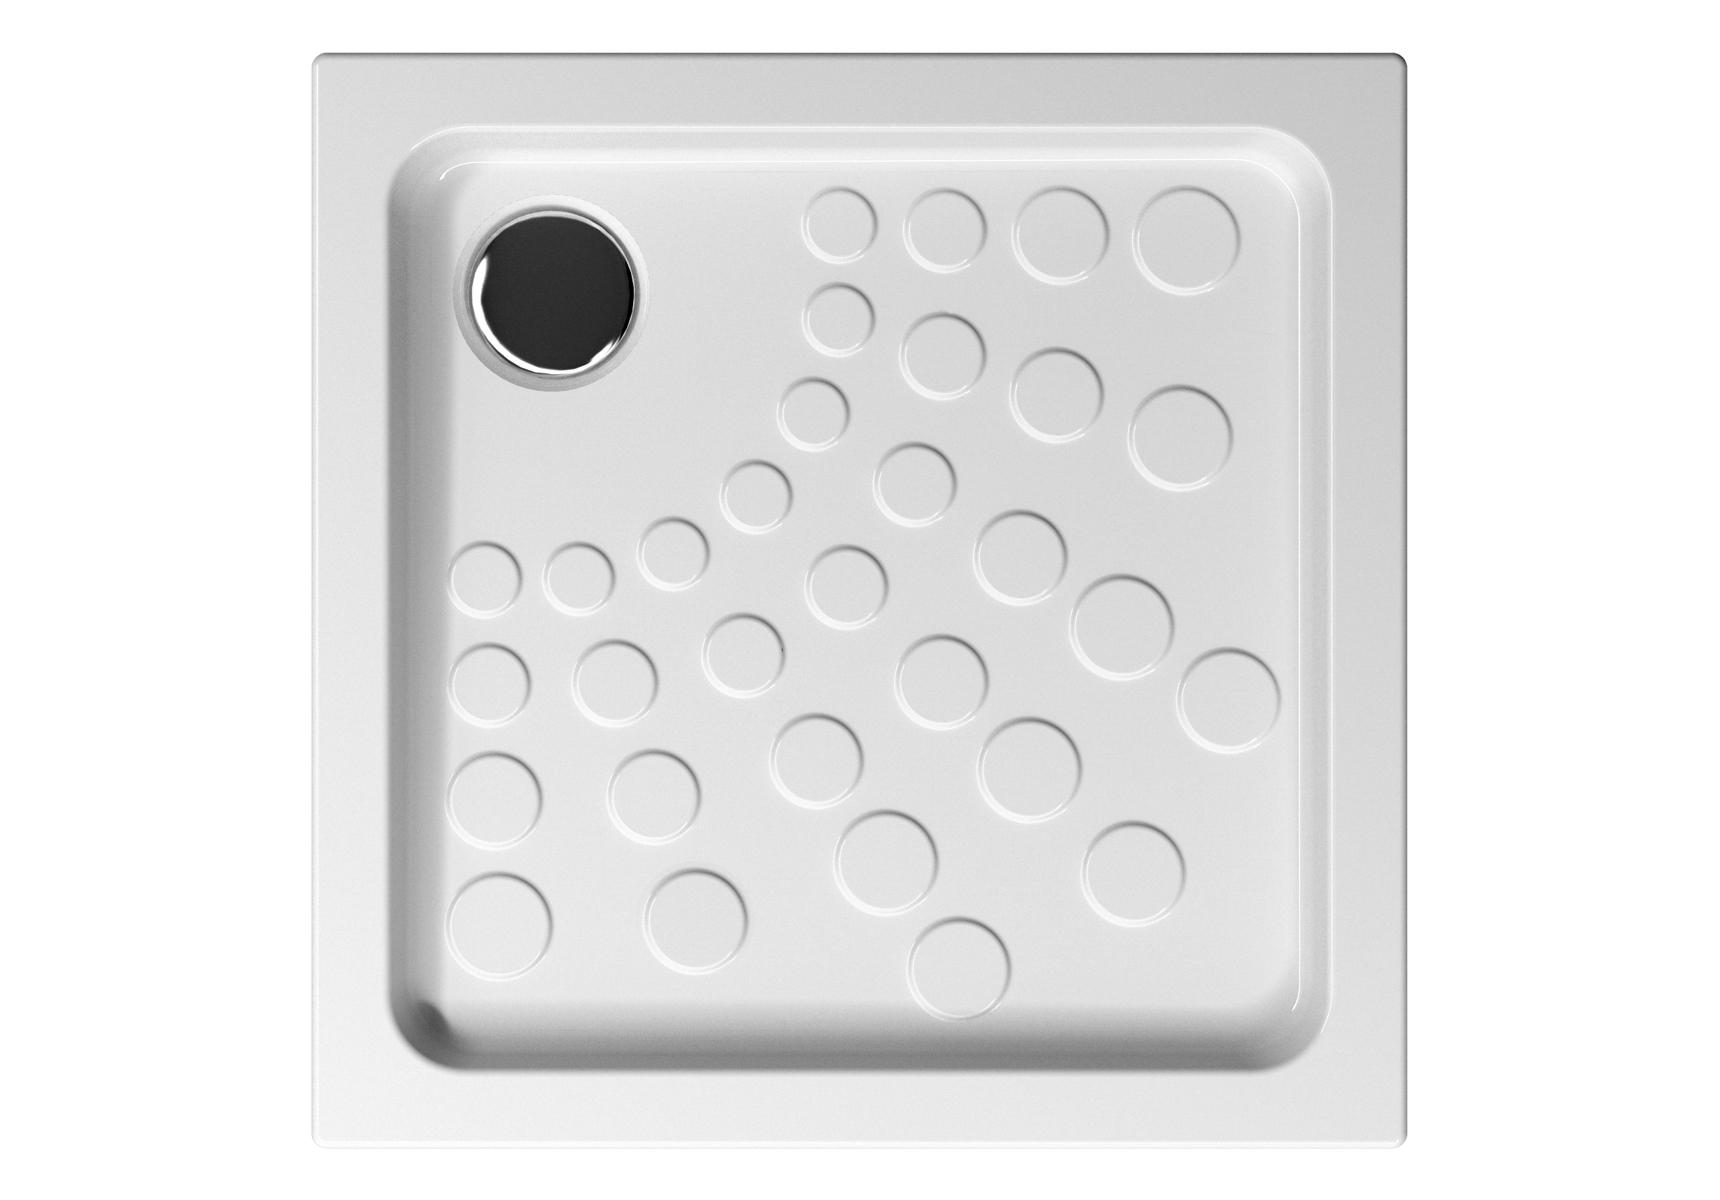 Arkitekt receveur à encastrer ou à poser fond extra plat, 70  x  70 cm, blanc